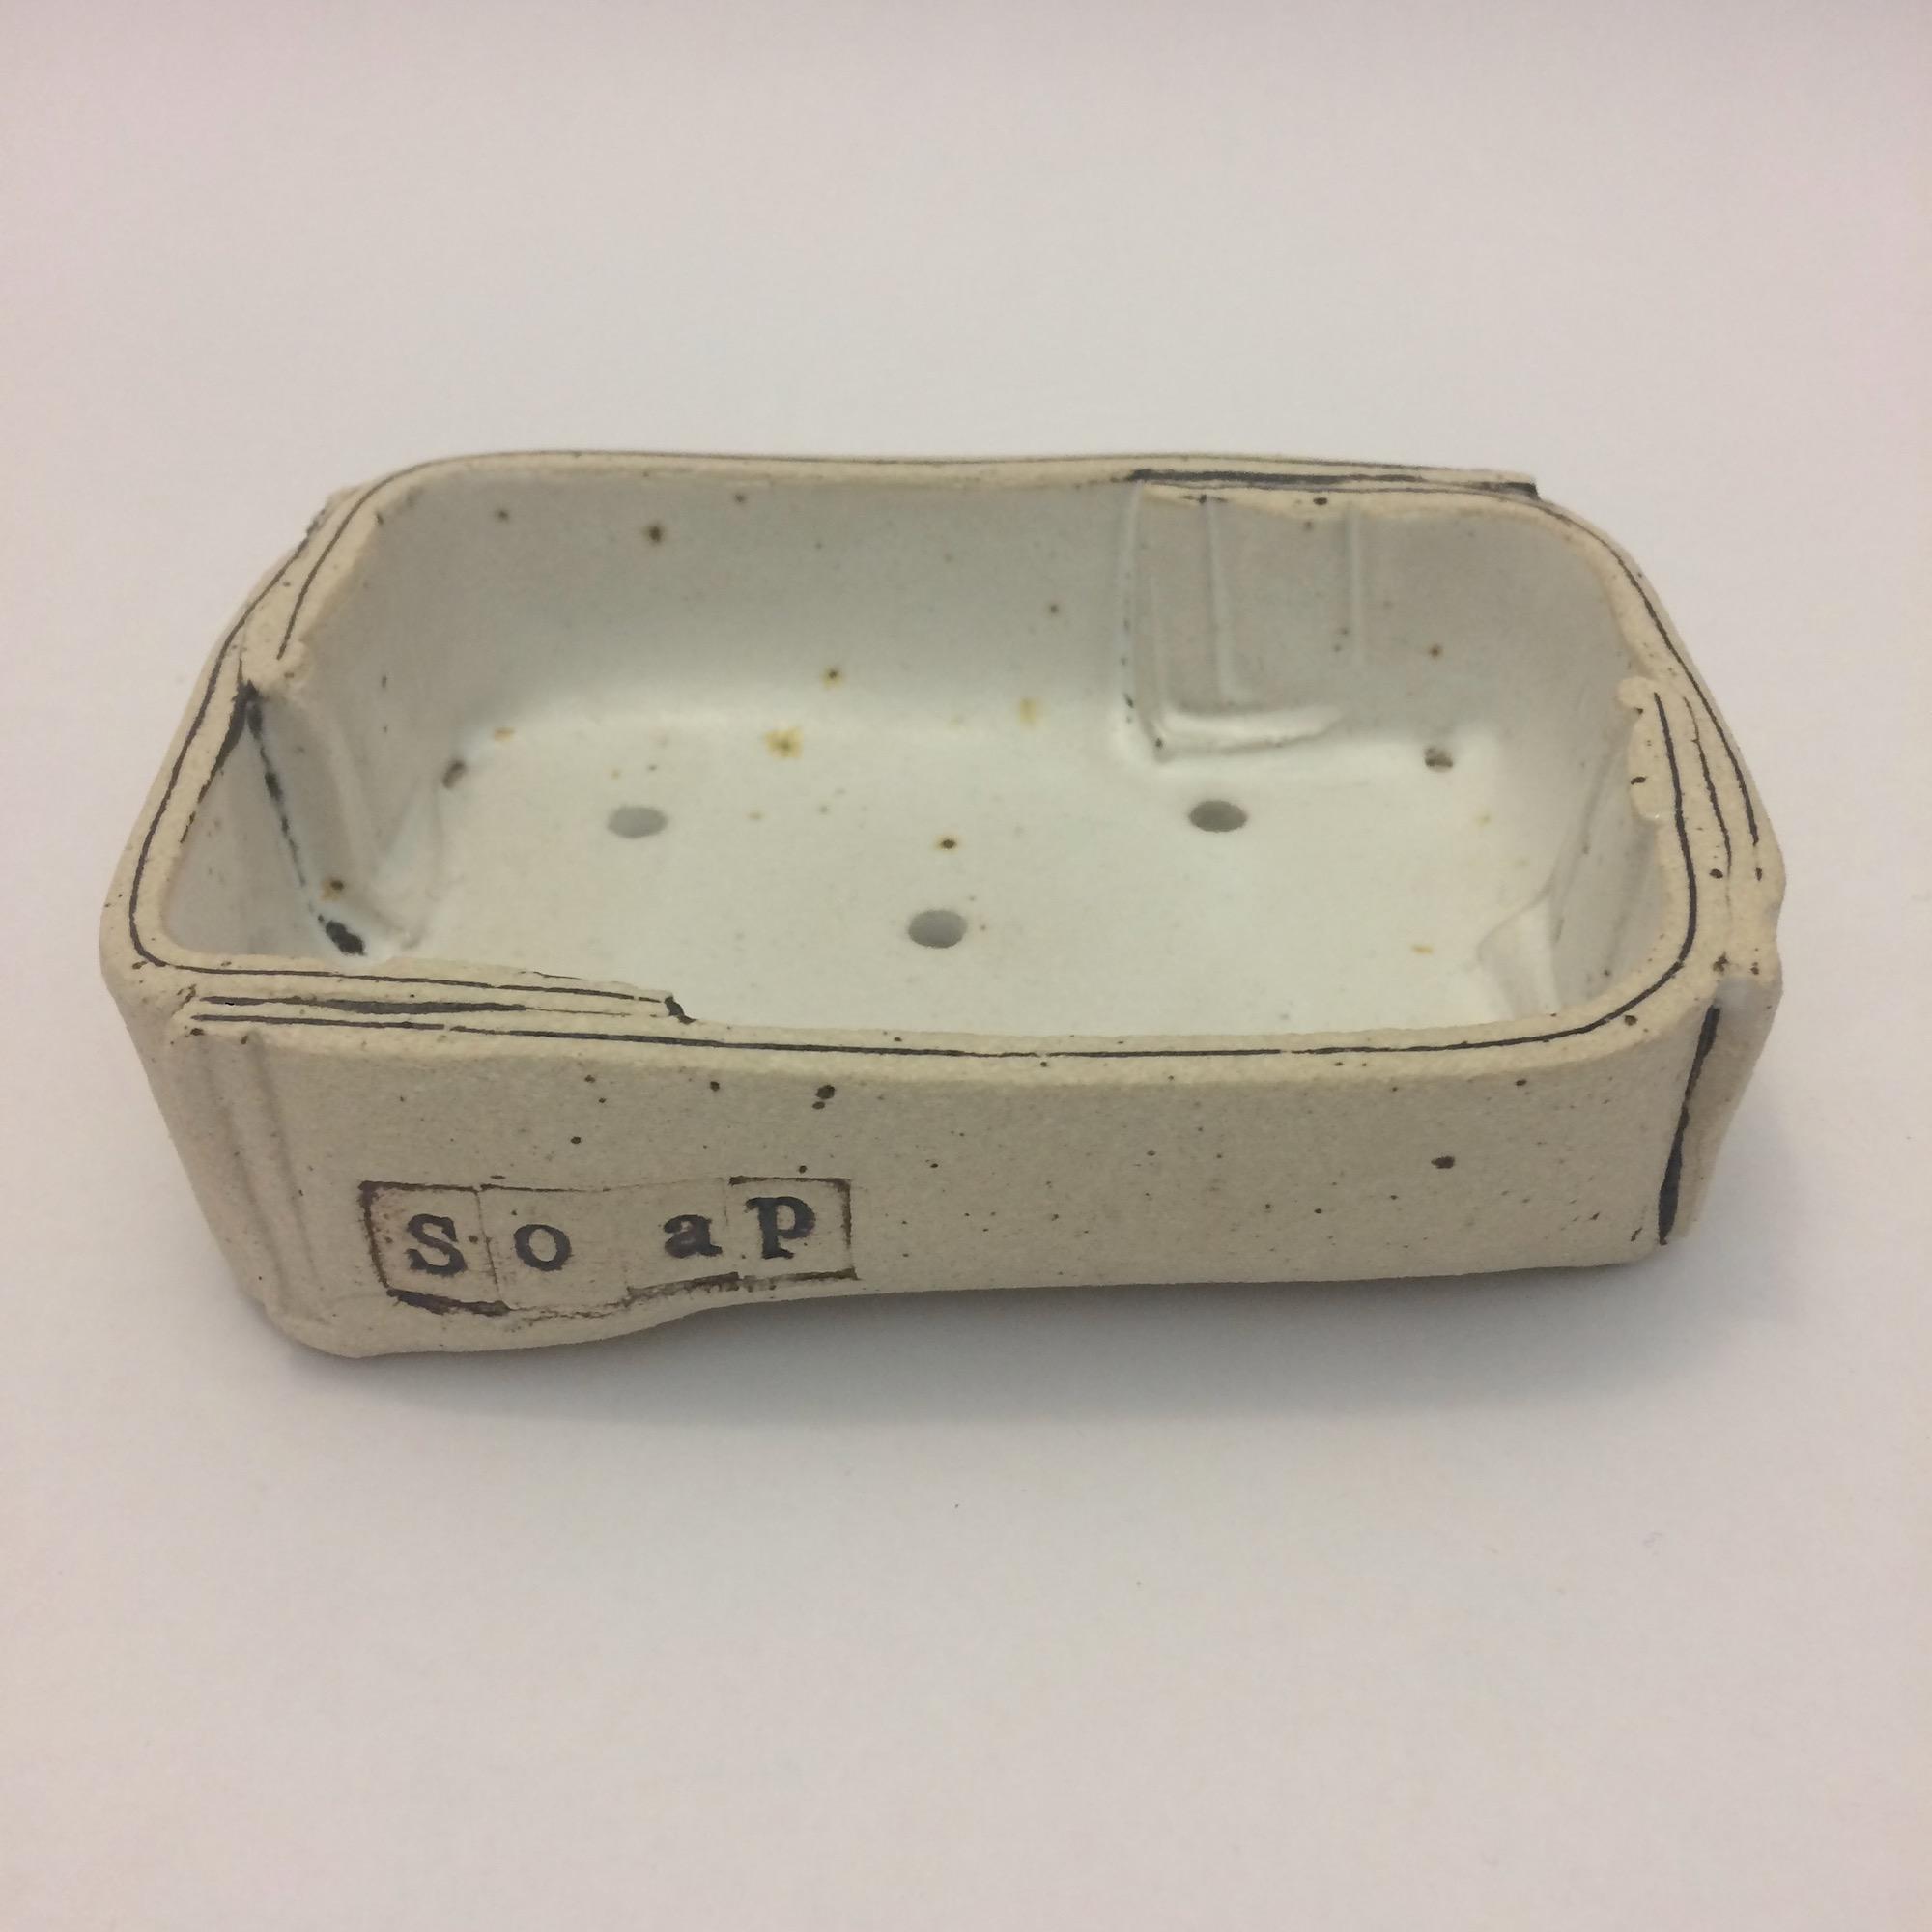 Handmade Flecked White Stoneware Soap Dish by Fiona Veacock